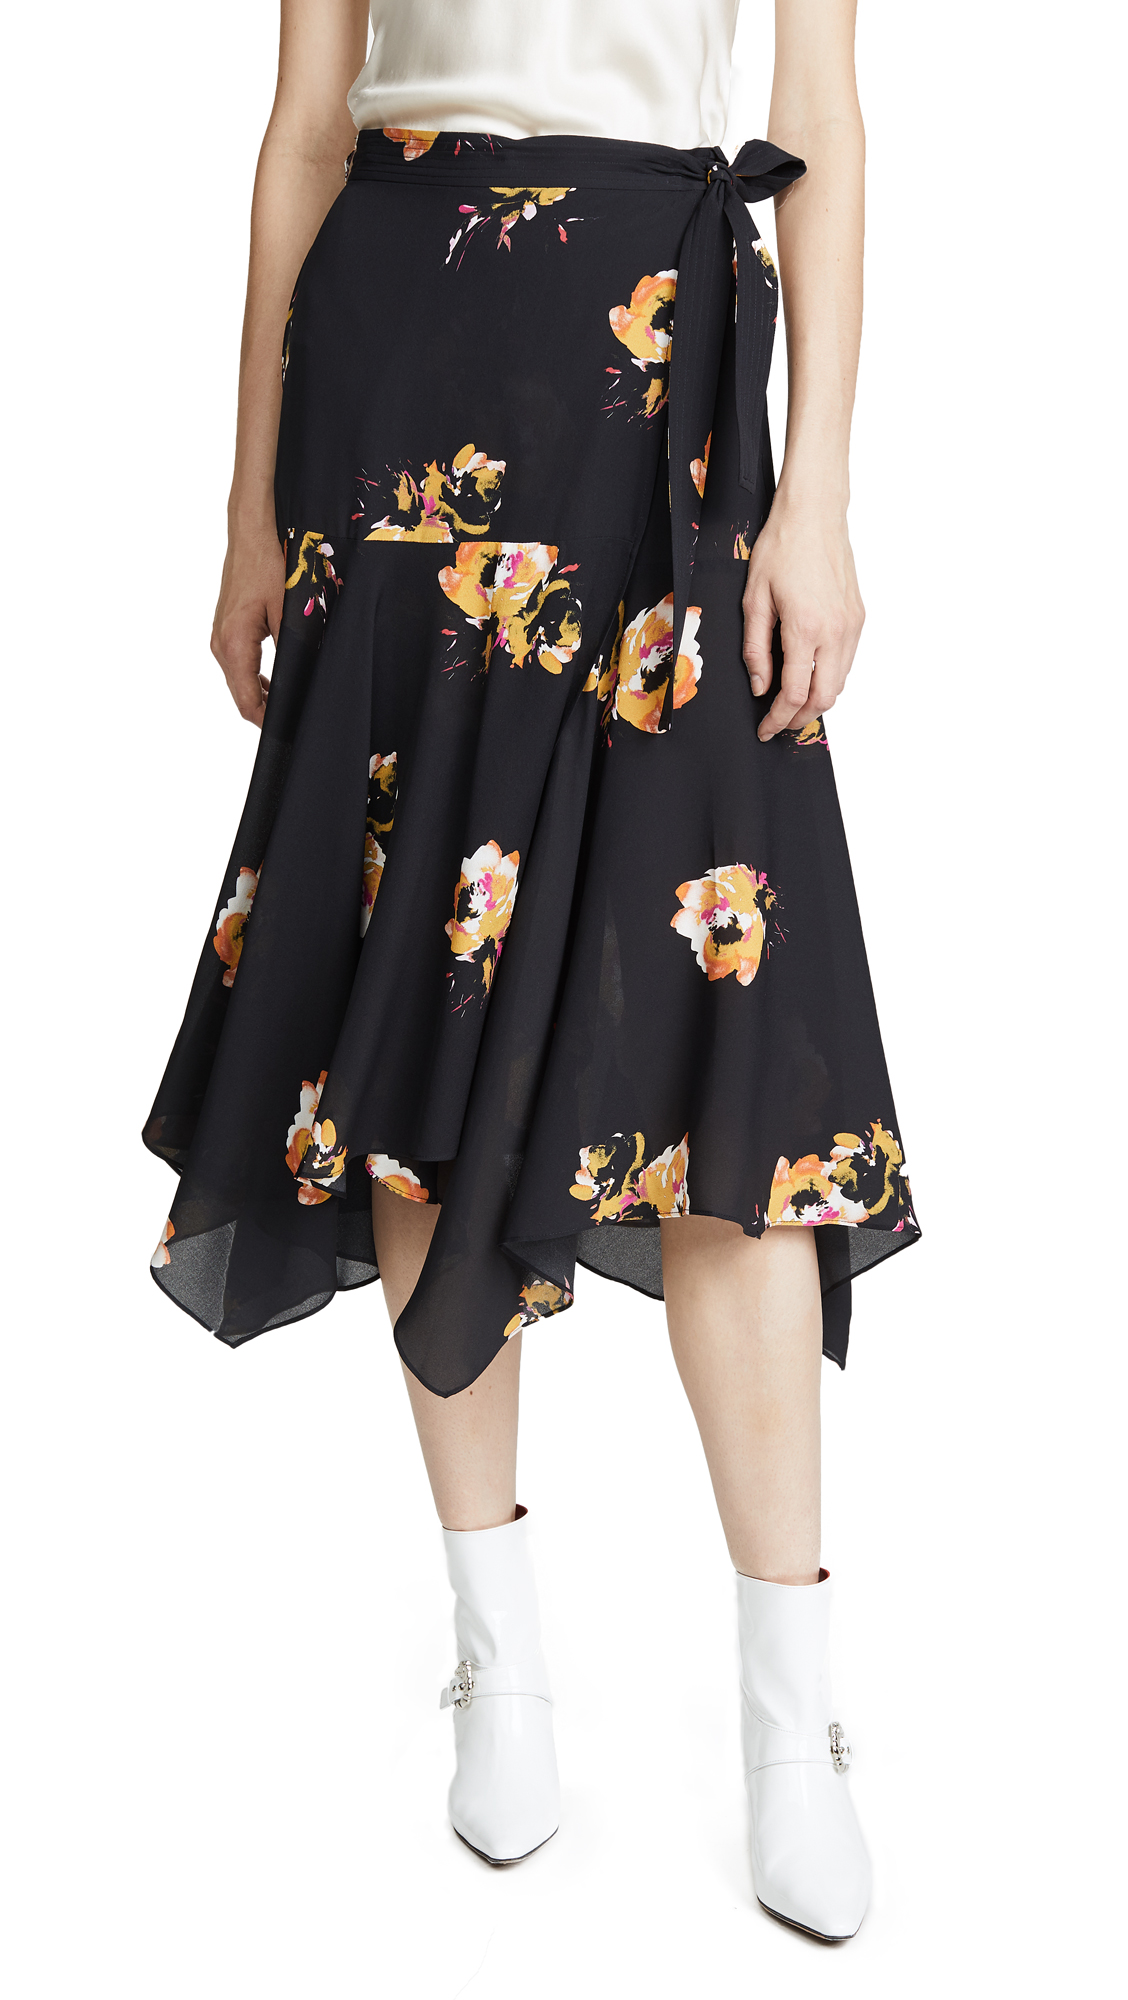 A.L.C. Borden Skirt In Black/Saffron